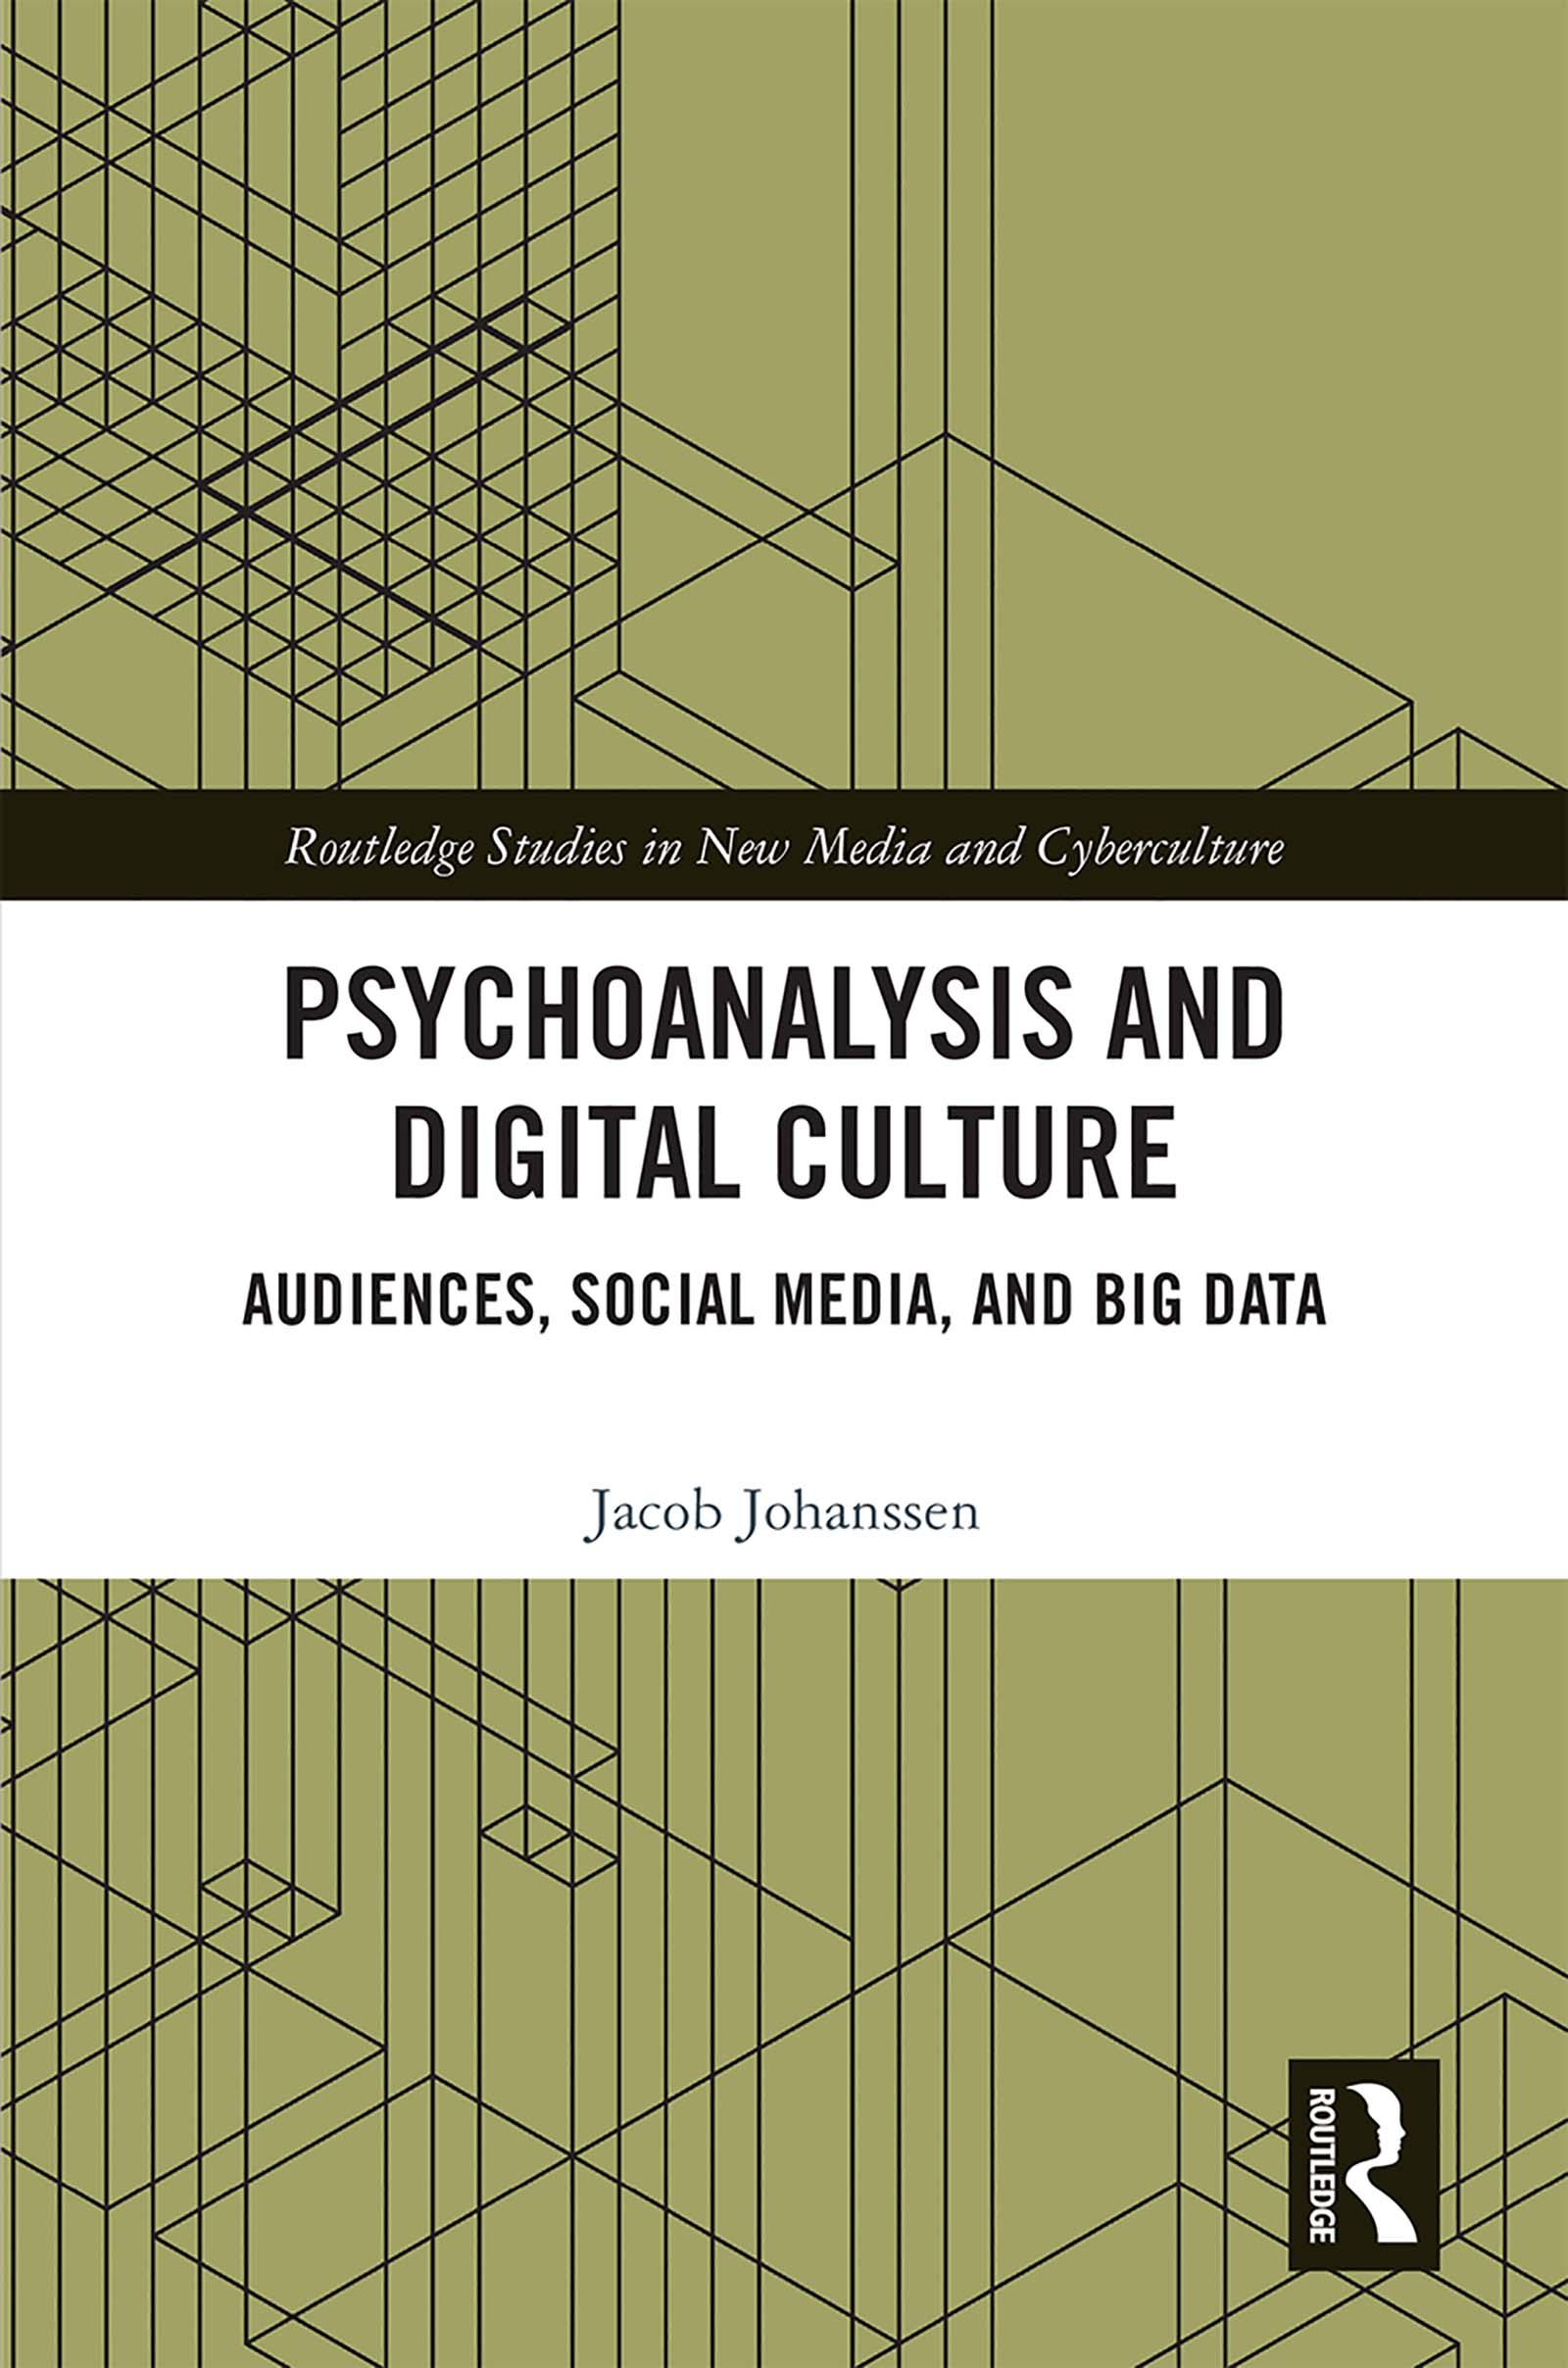 Psychoanalysis and Digital Culture